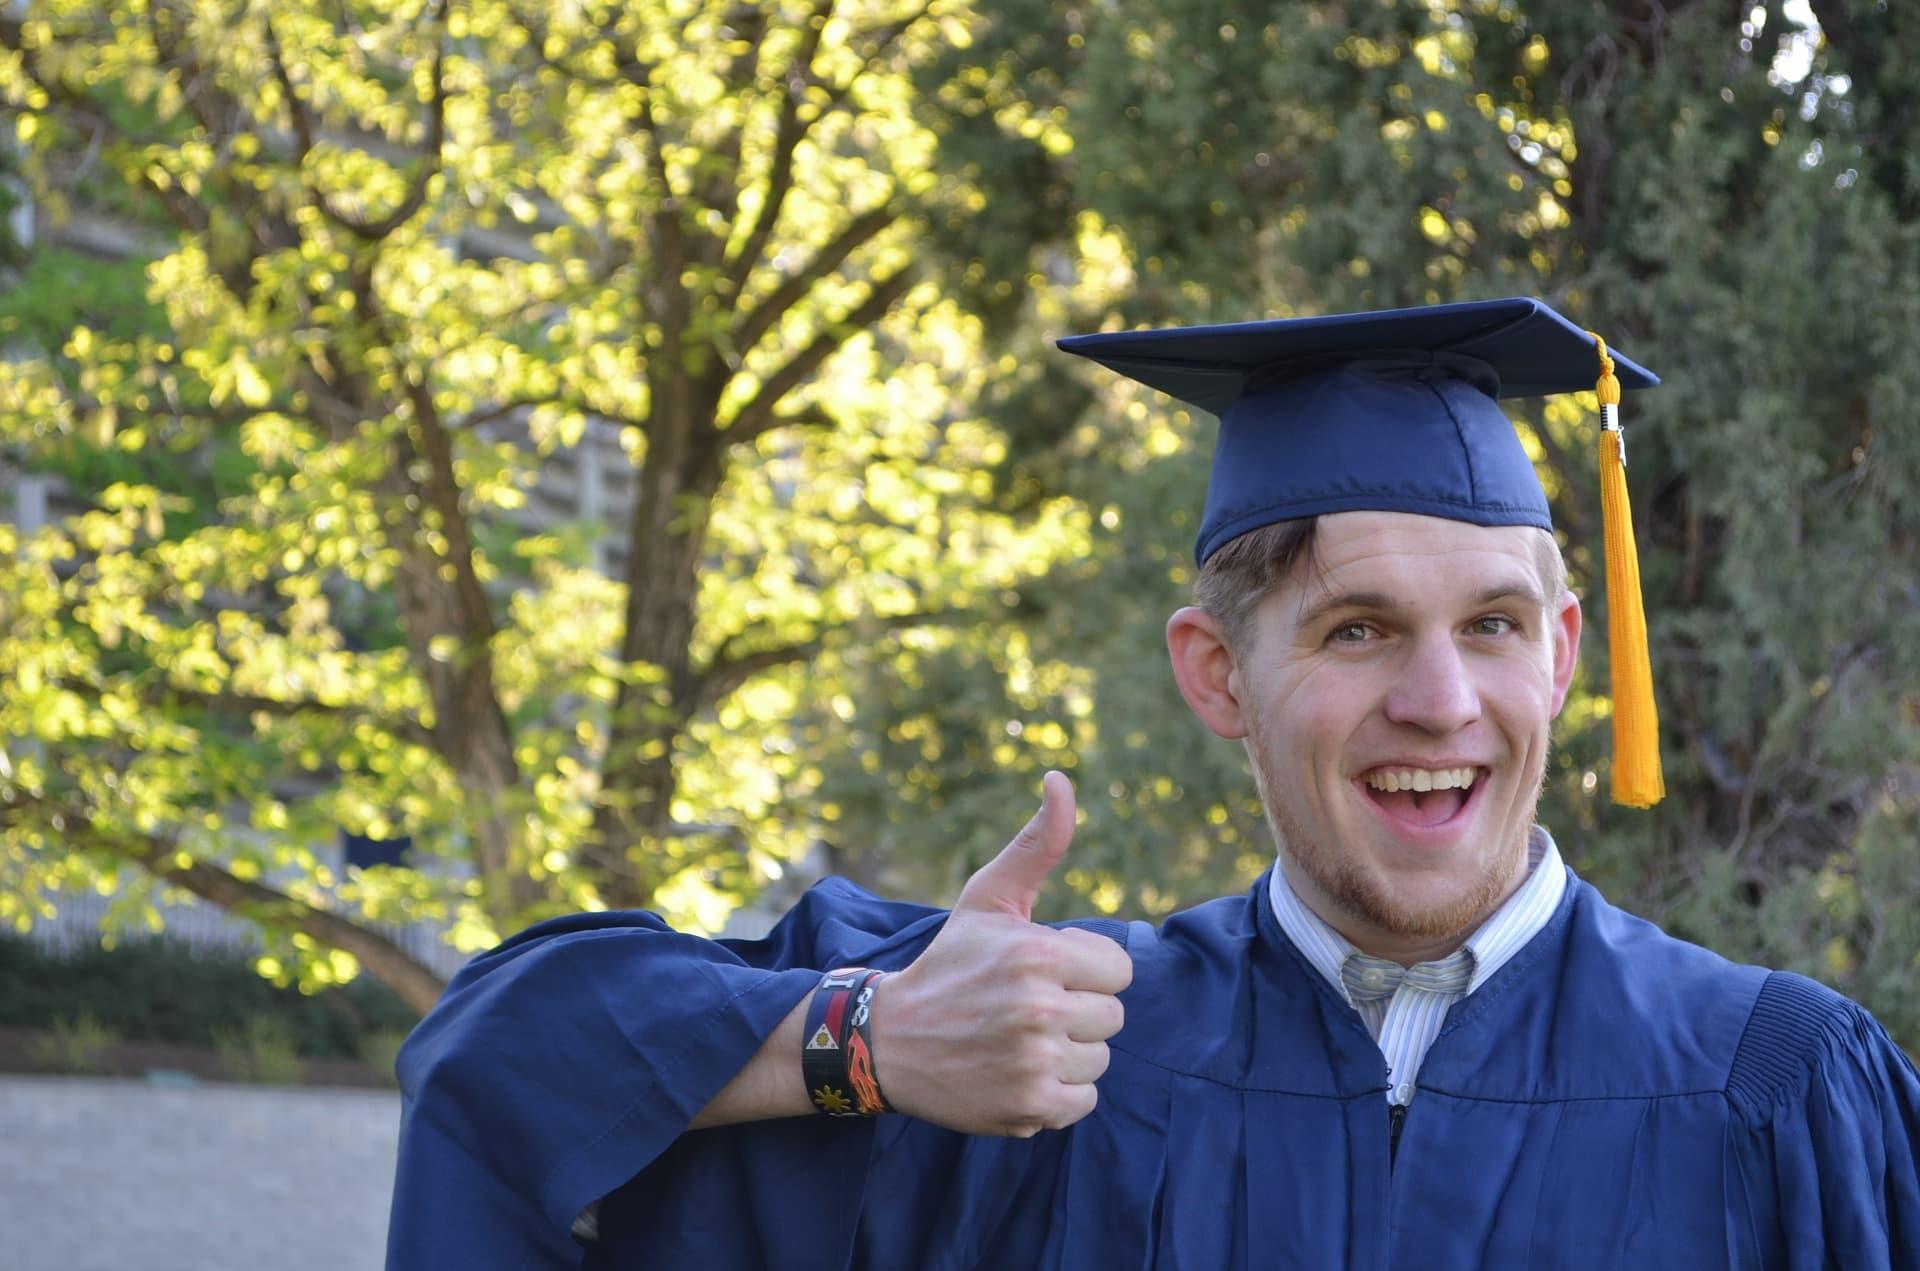 Aforismi-per-la-laurea-i-migliori-auguri-di-laurea-tesilike